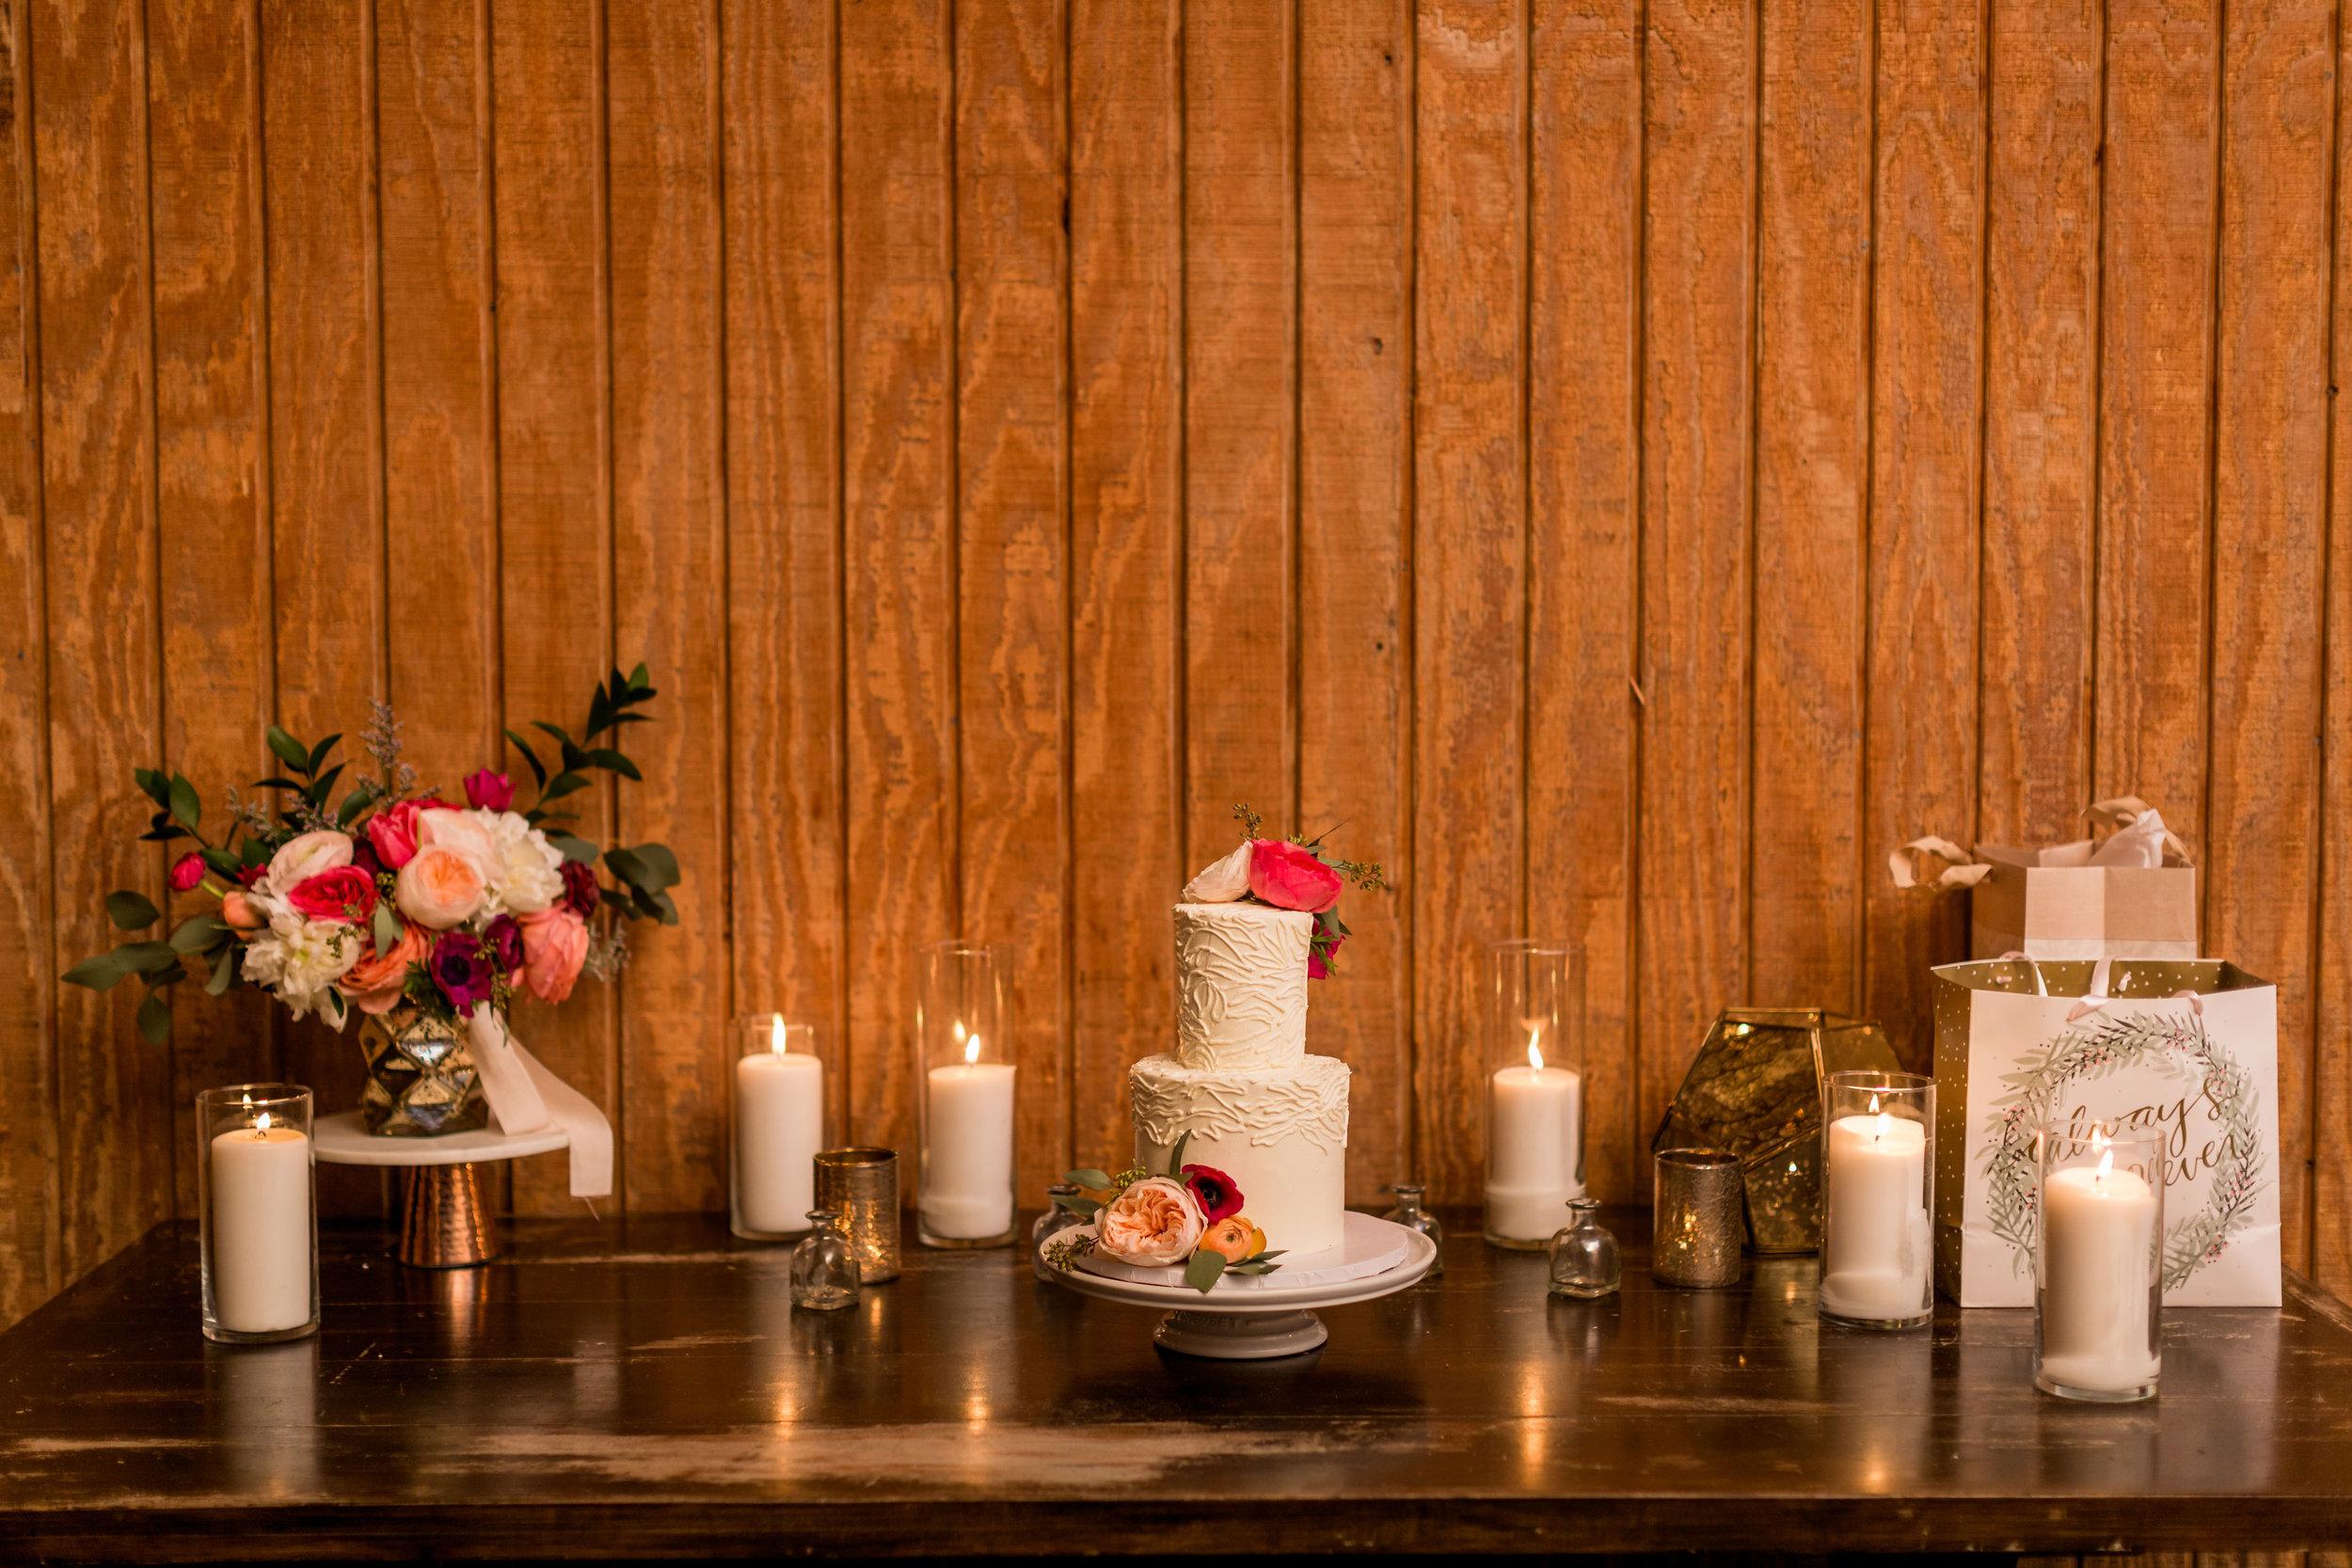 charleston new years elopement popup surprise wedding at upstairs at midtown - scarlet plan & design wedding planners (351).jpg